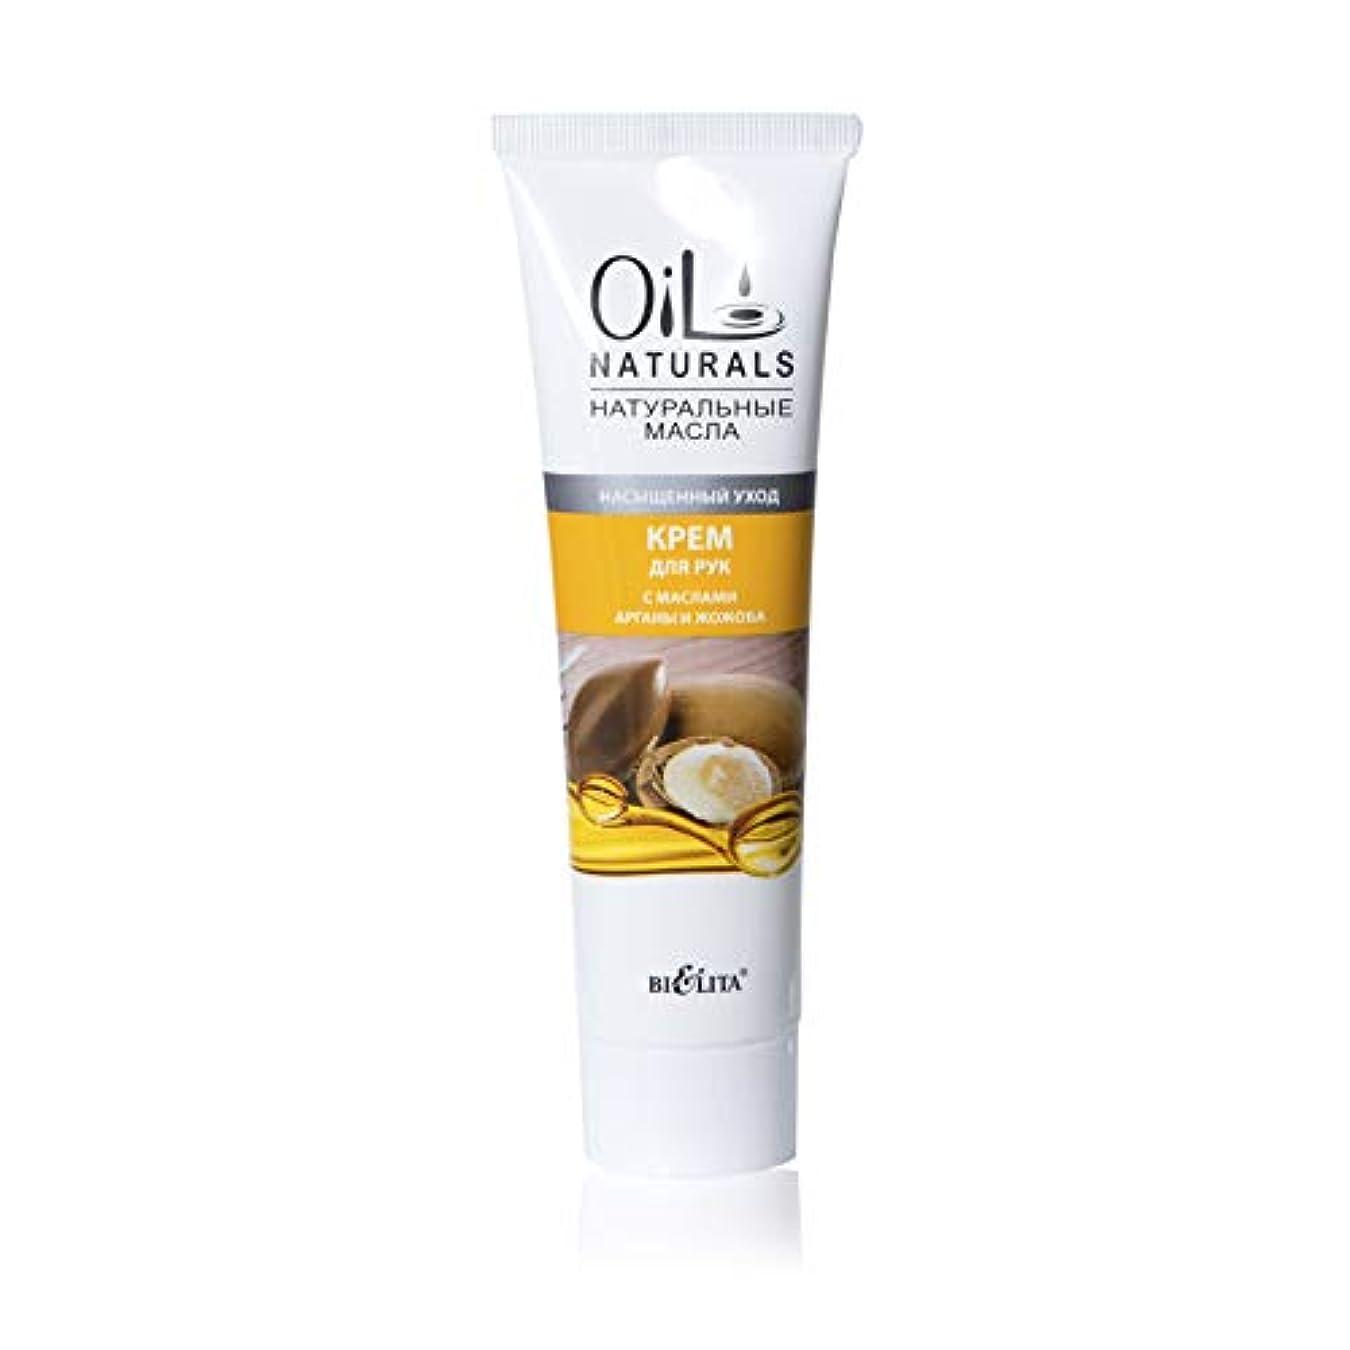 考古学シート不誠実Bielita & Vitex Oil Naturals Line | Saturate Care Hand Cream, 100 ml | Argan Oil, Silk Proteins, Jojoba Oil, Vitamins